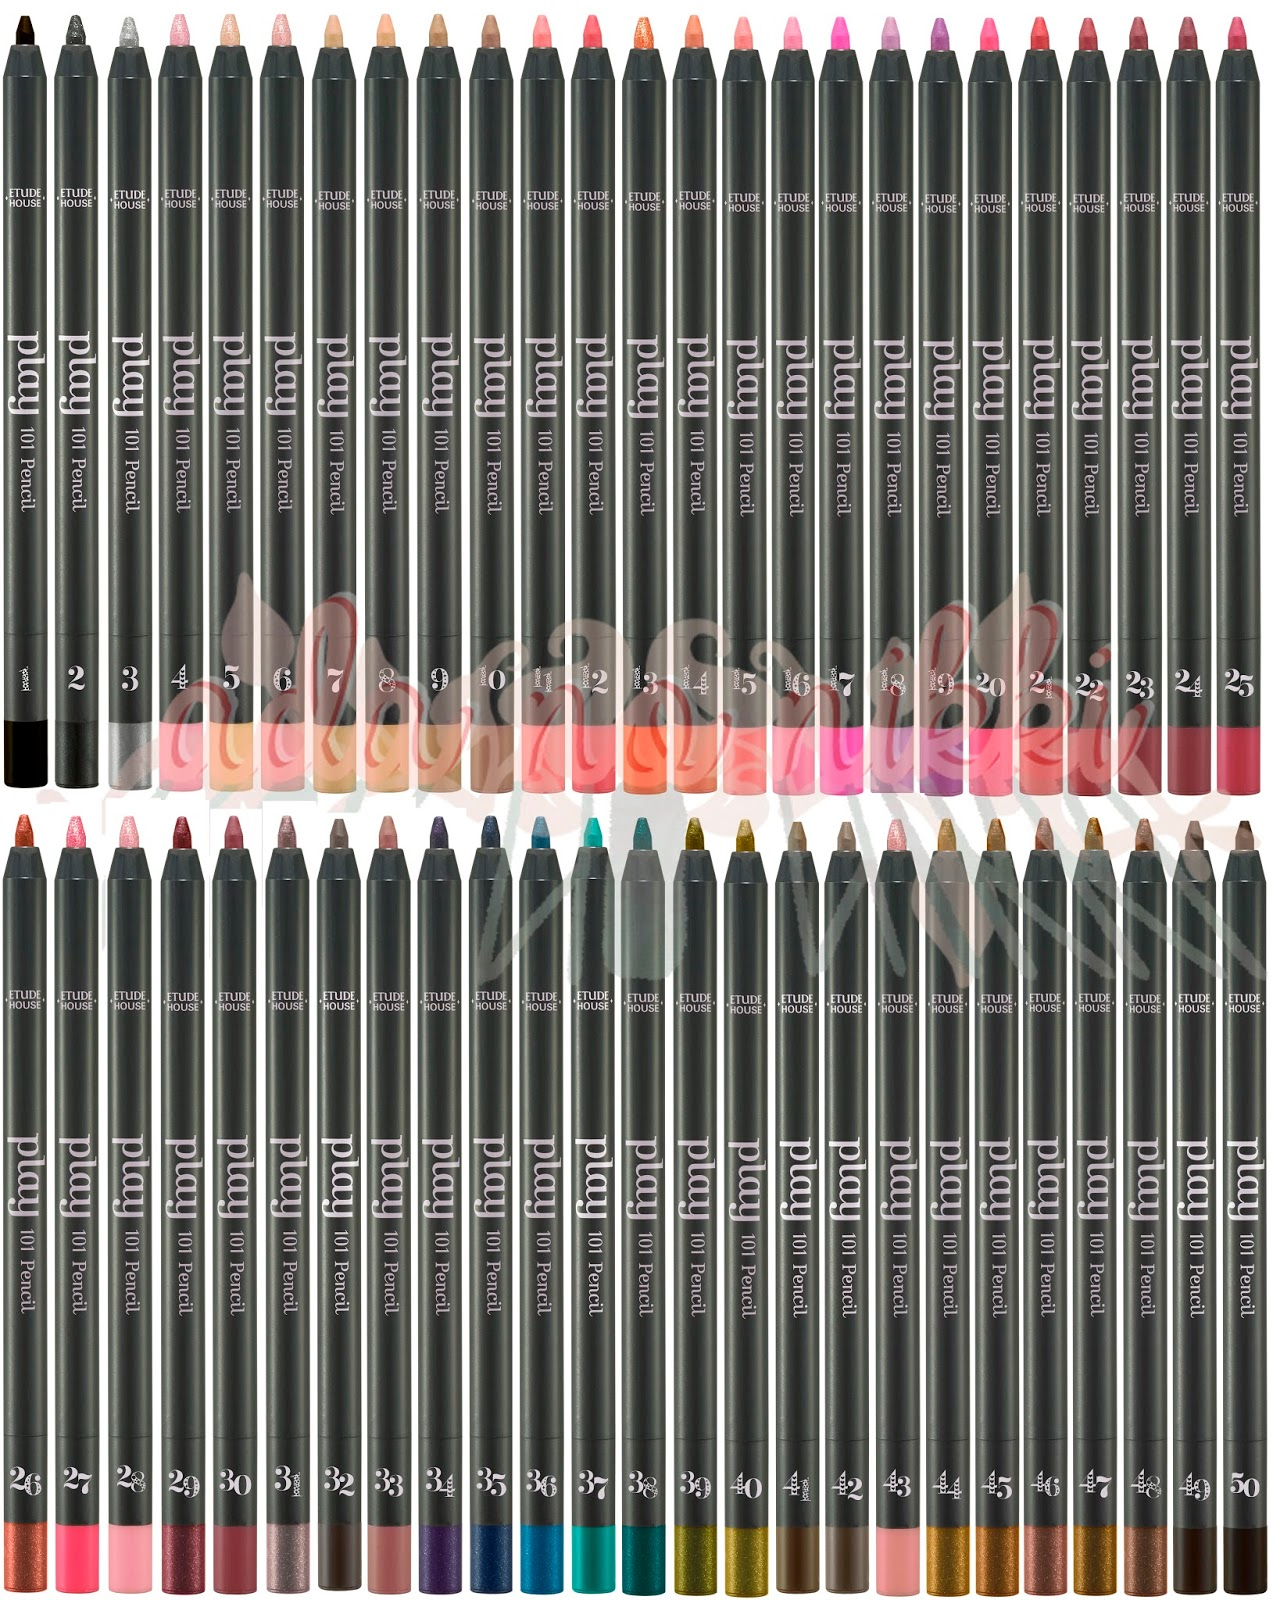 Etude House Play 101 Pencils matte, cream, glossy, glitter, shimmery, finish